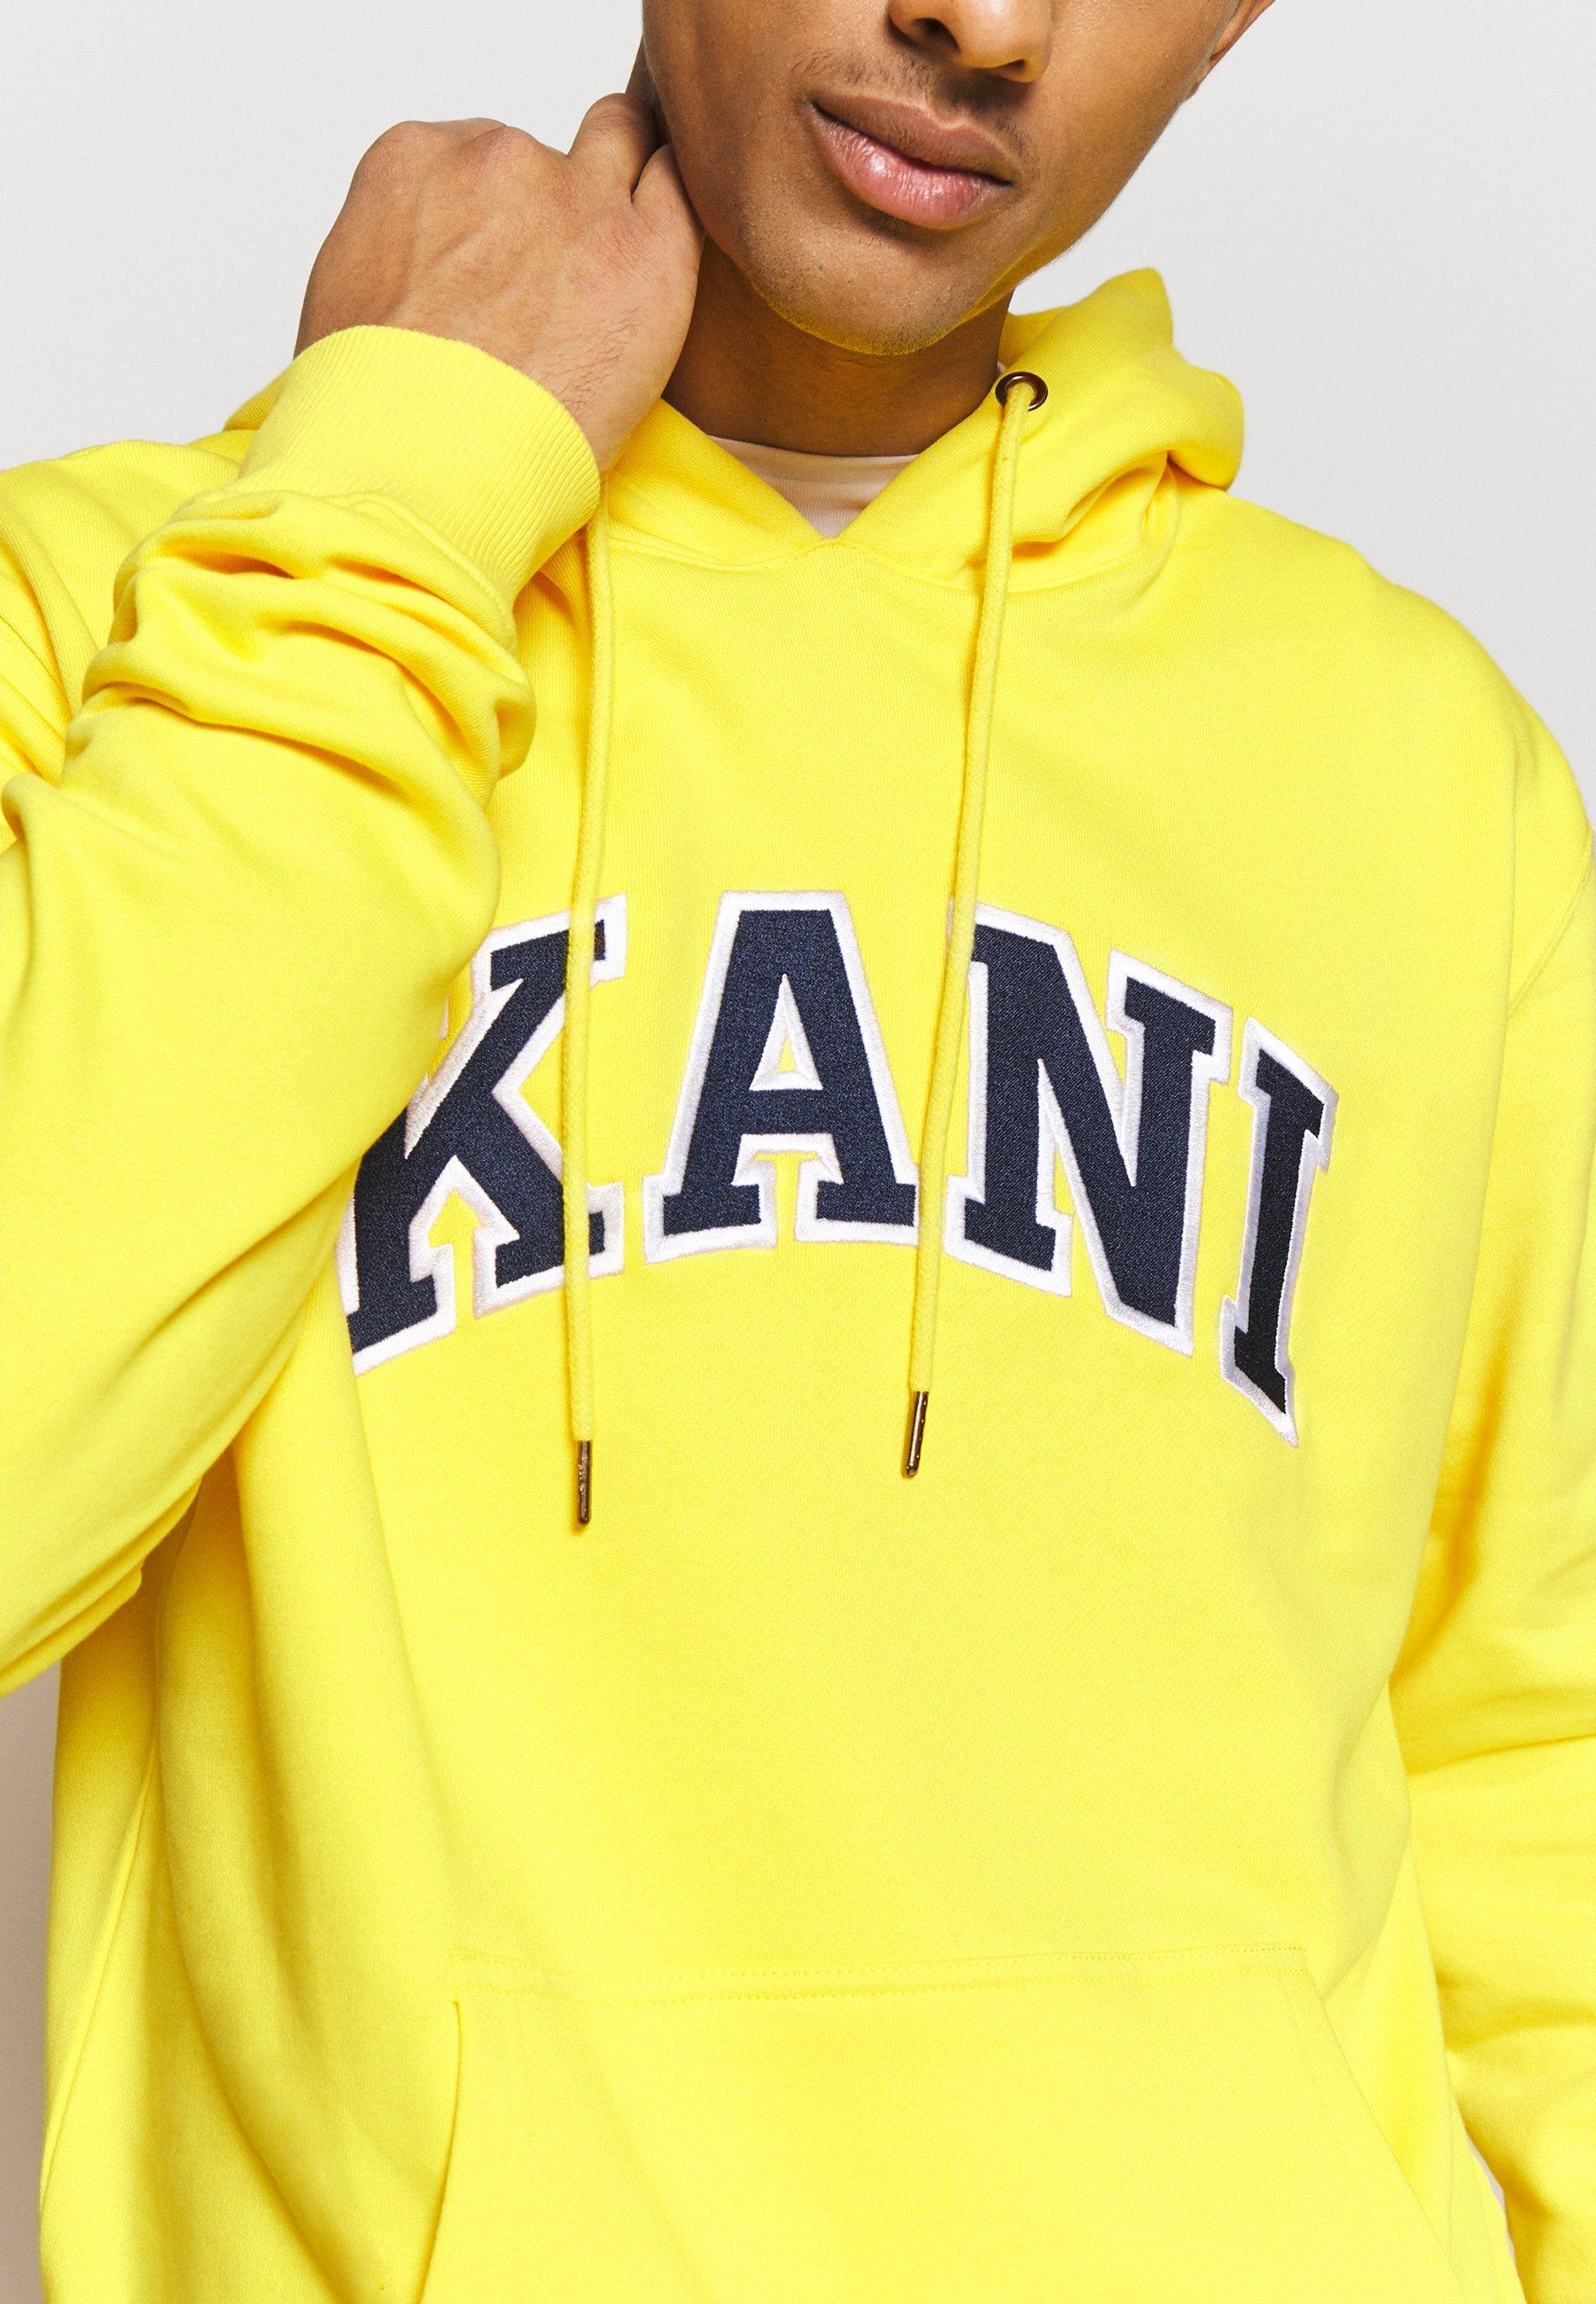 100% Aito Miesten vaatteet Sarja dfKJIUp97454sfGHYHD Karl Kani COLLEGE HOODIE Huppari yellow/navy/white